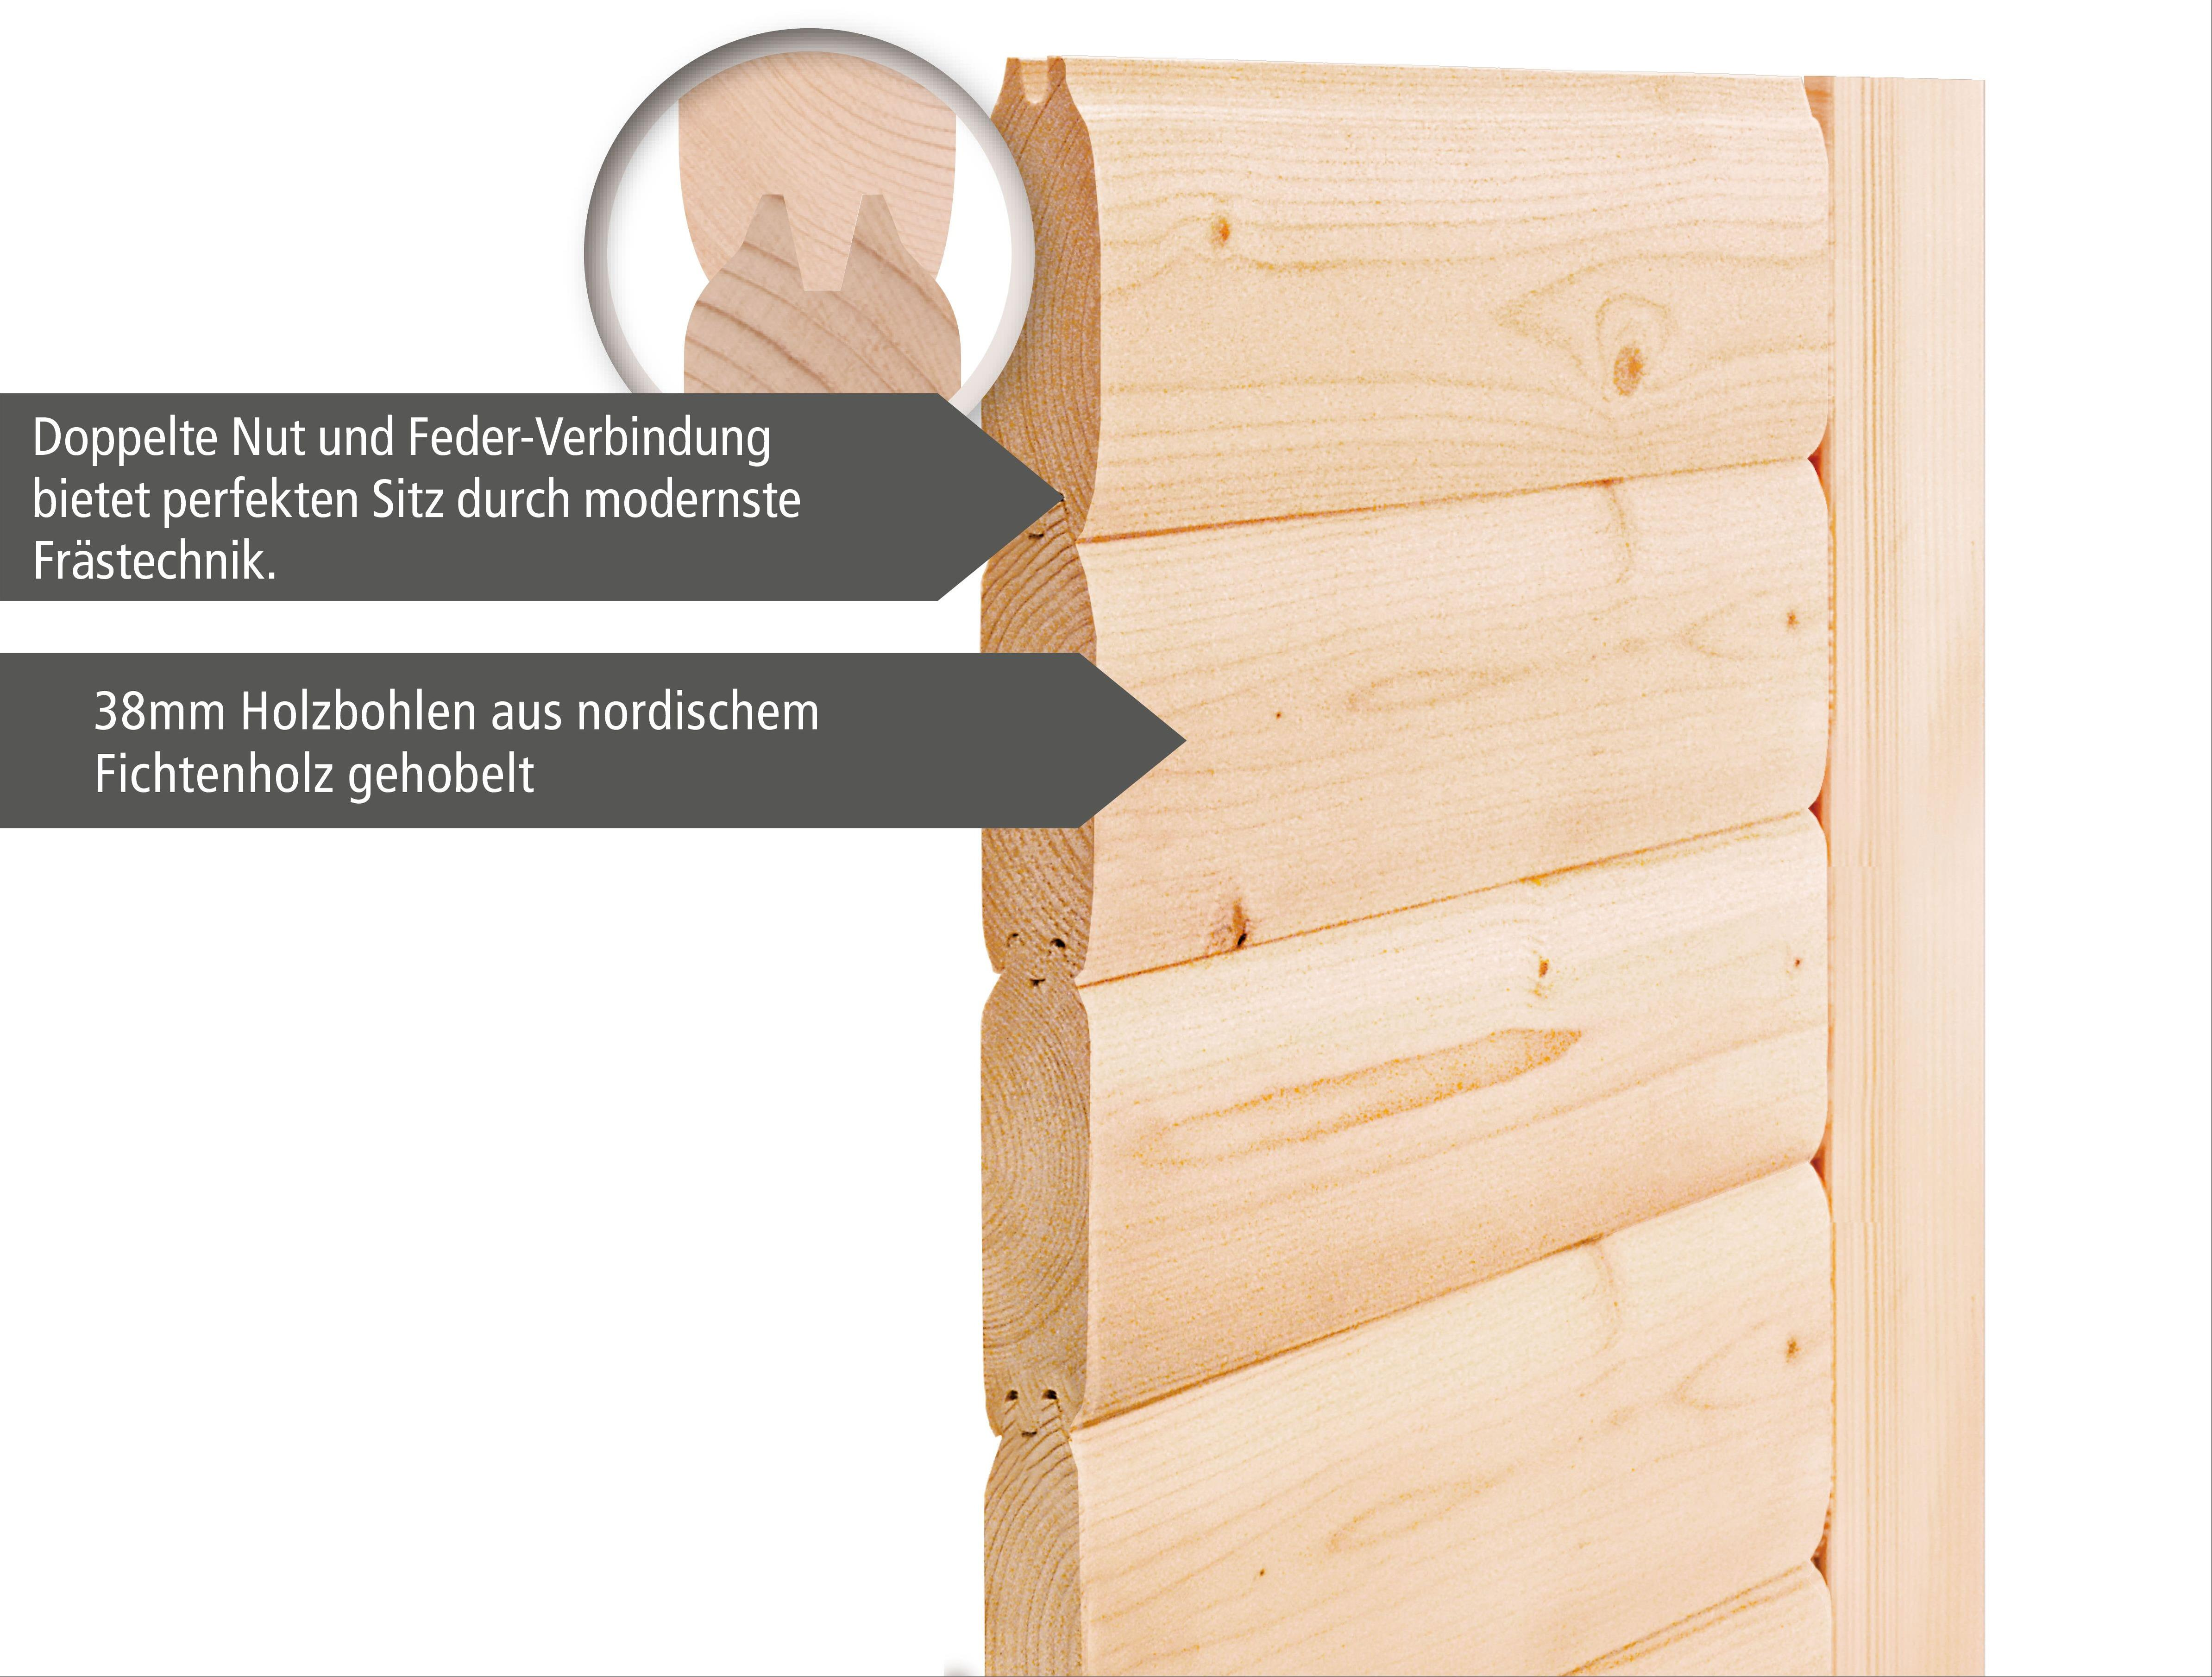 Woodfeeling Sauna Karla 38mm Kranz Ofen 9kW extern Tür Klarglas Bild 5